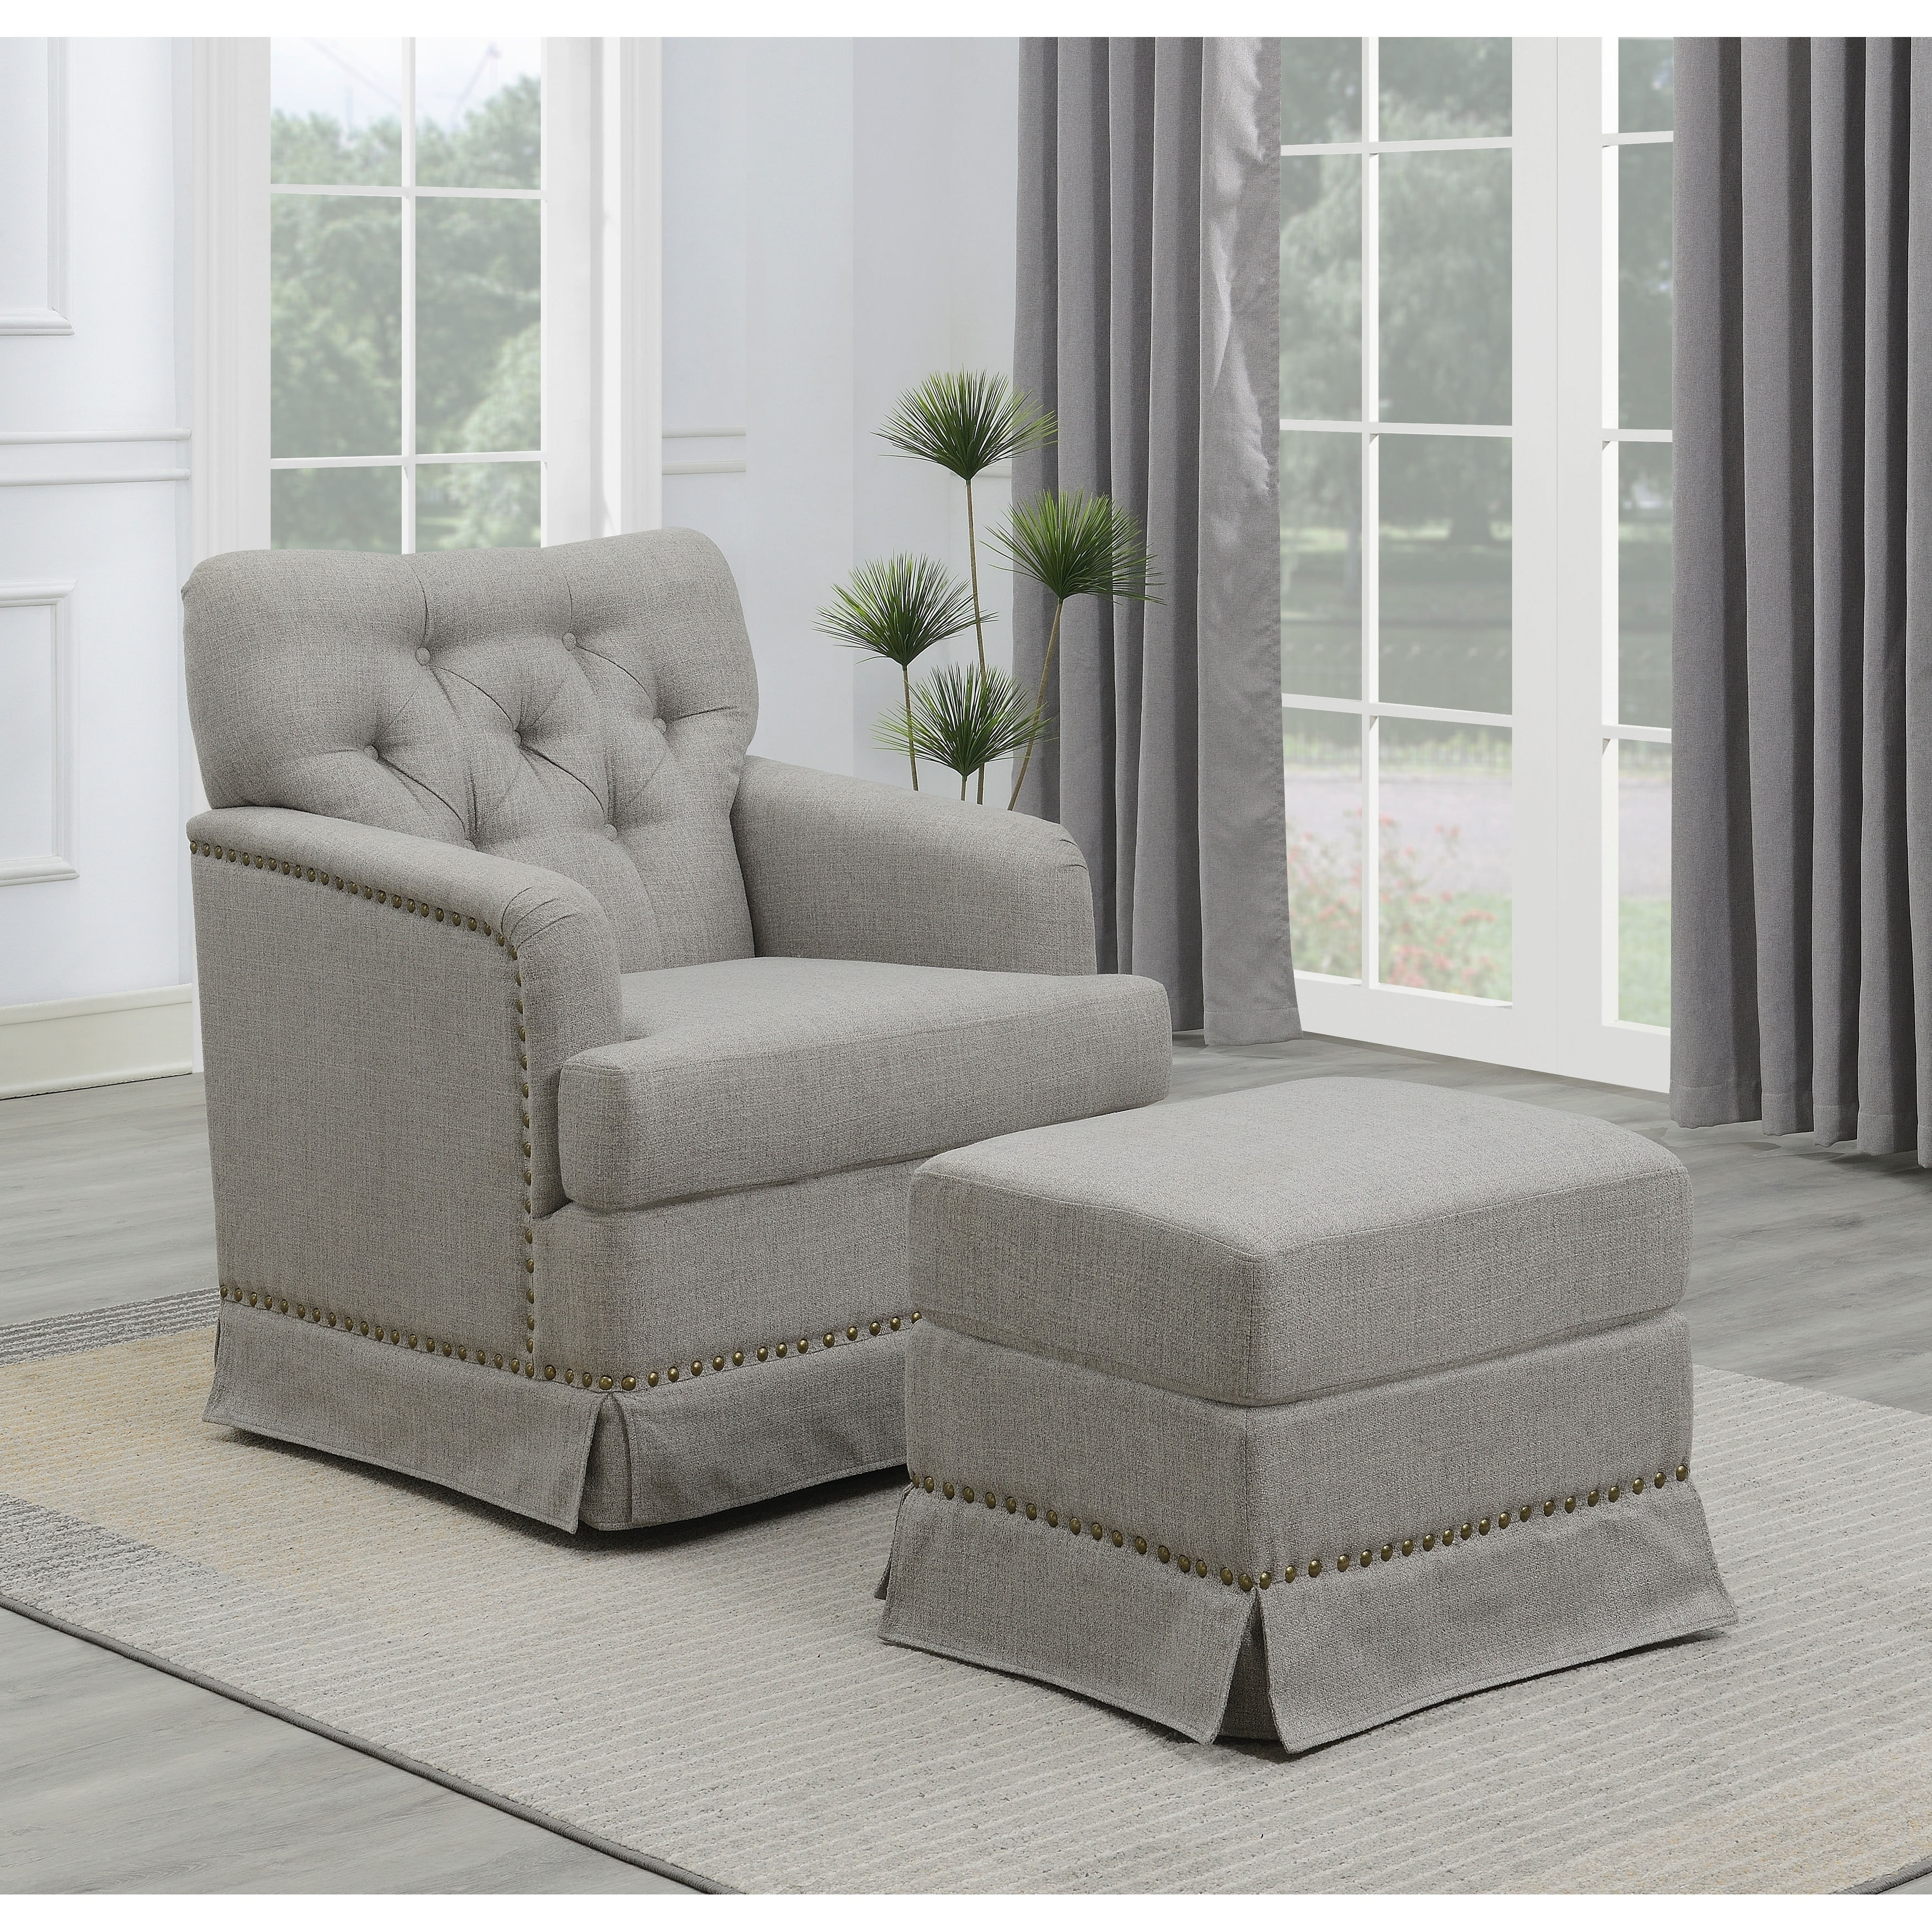 Emerald Home Ashdale Cement Swivel Glider Chair Ottoman Set